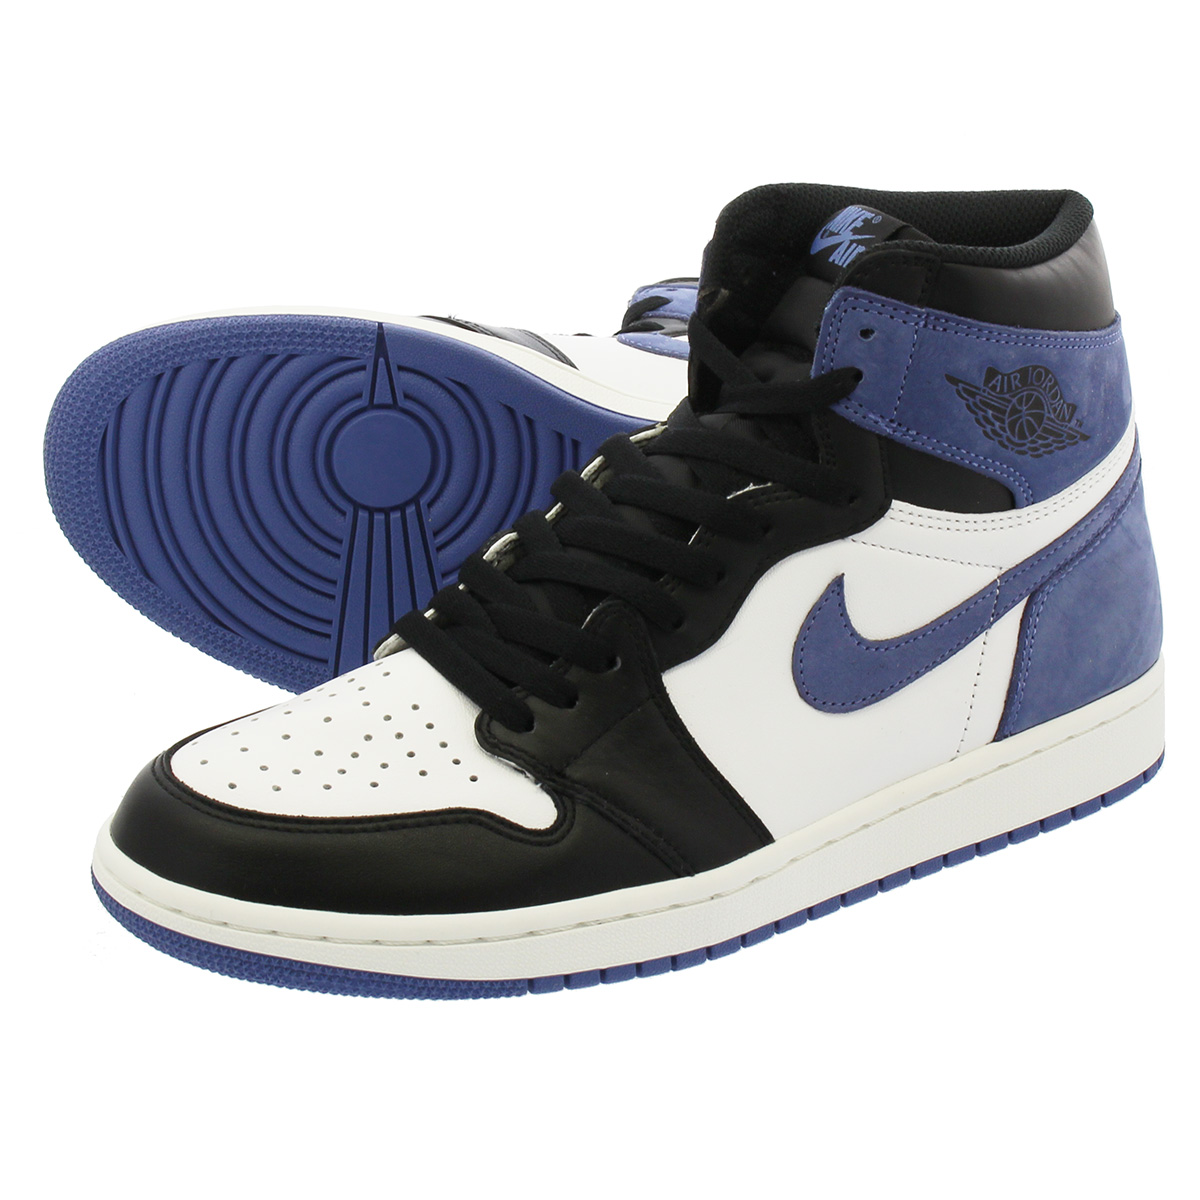 the latest 10e65 60e91 NIKE AIR JORDAN 1 RETRO HIGH OG Nike Air Jordan 1 nostalgic high OG SUMMIT  WHITE/BLUE MOON/BLACK 555,088-115